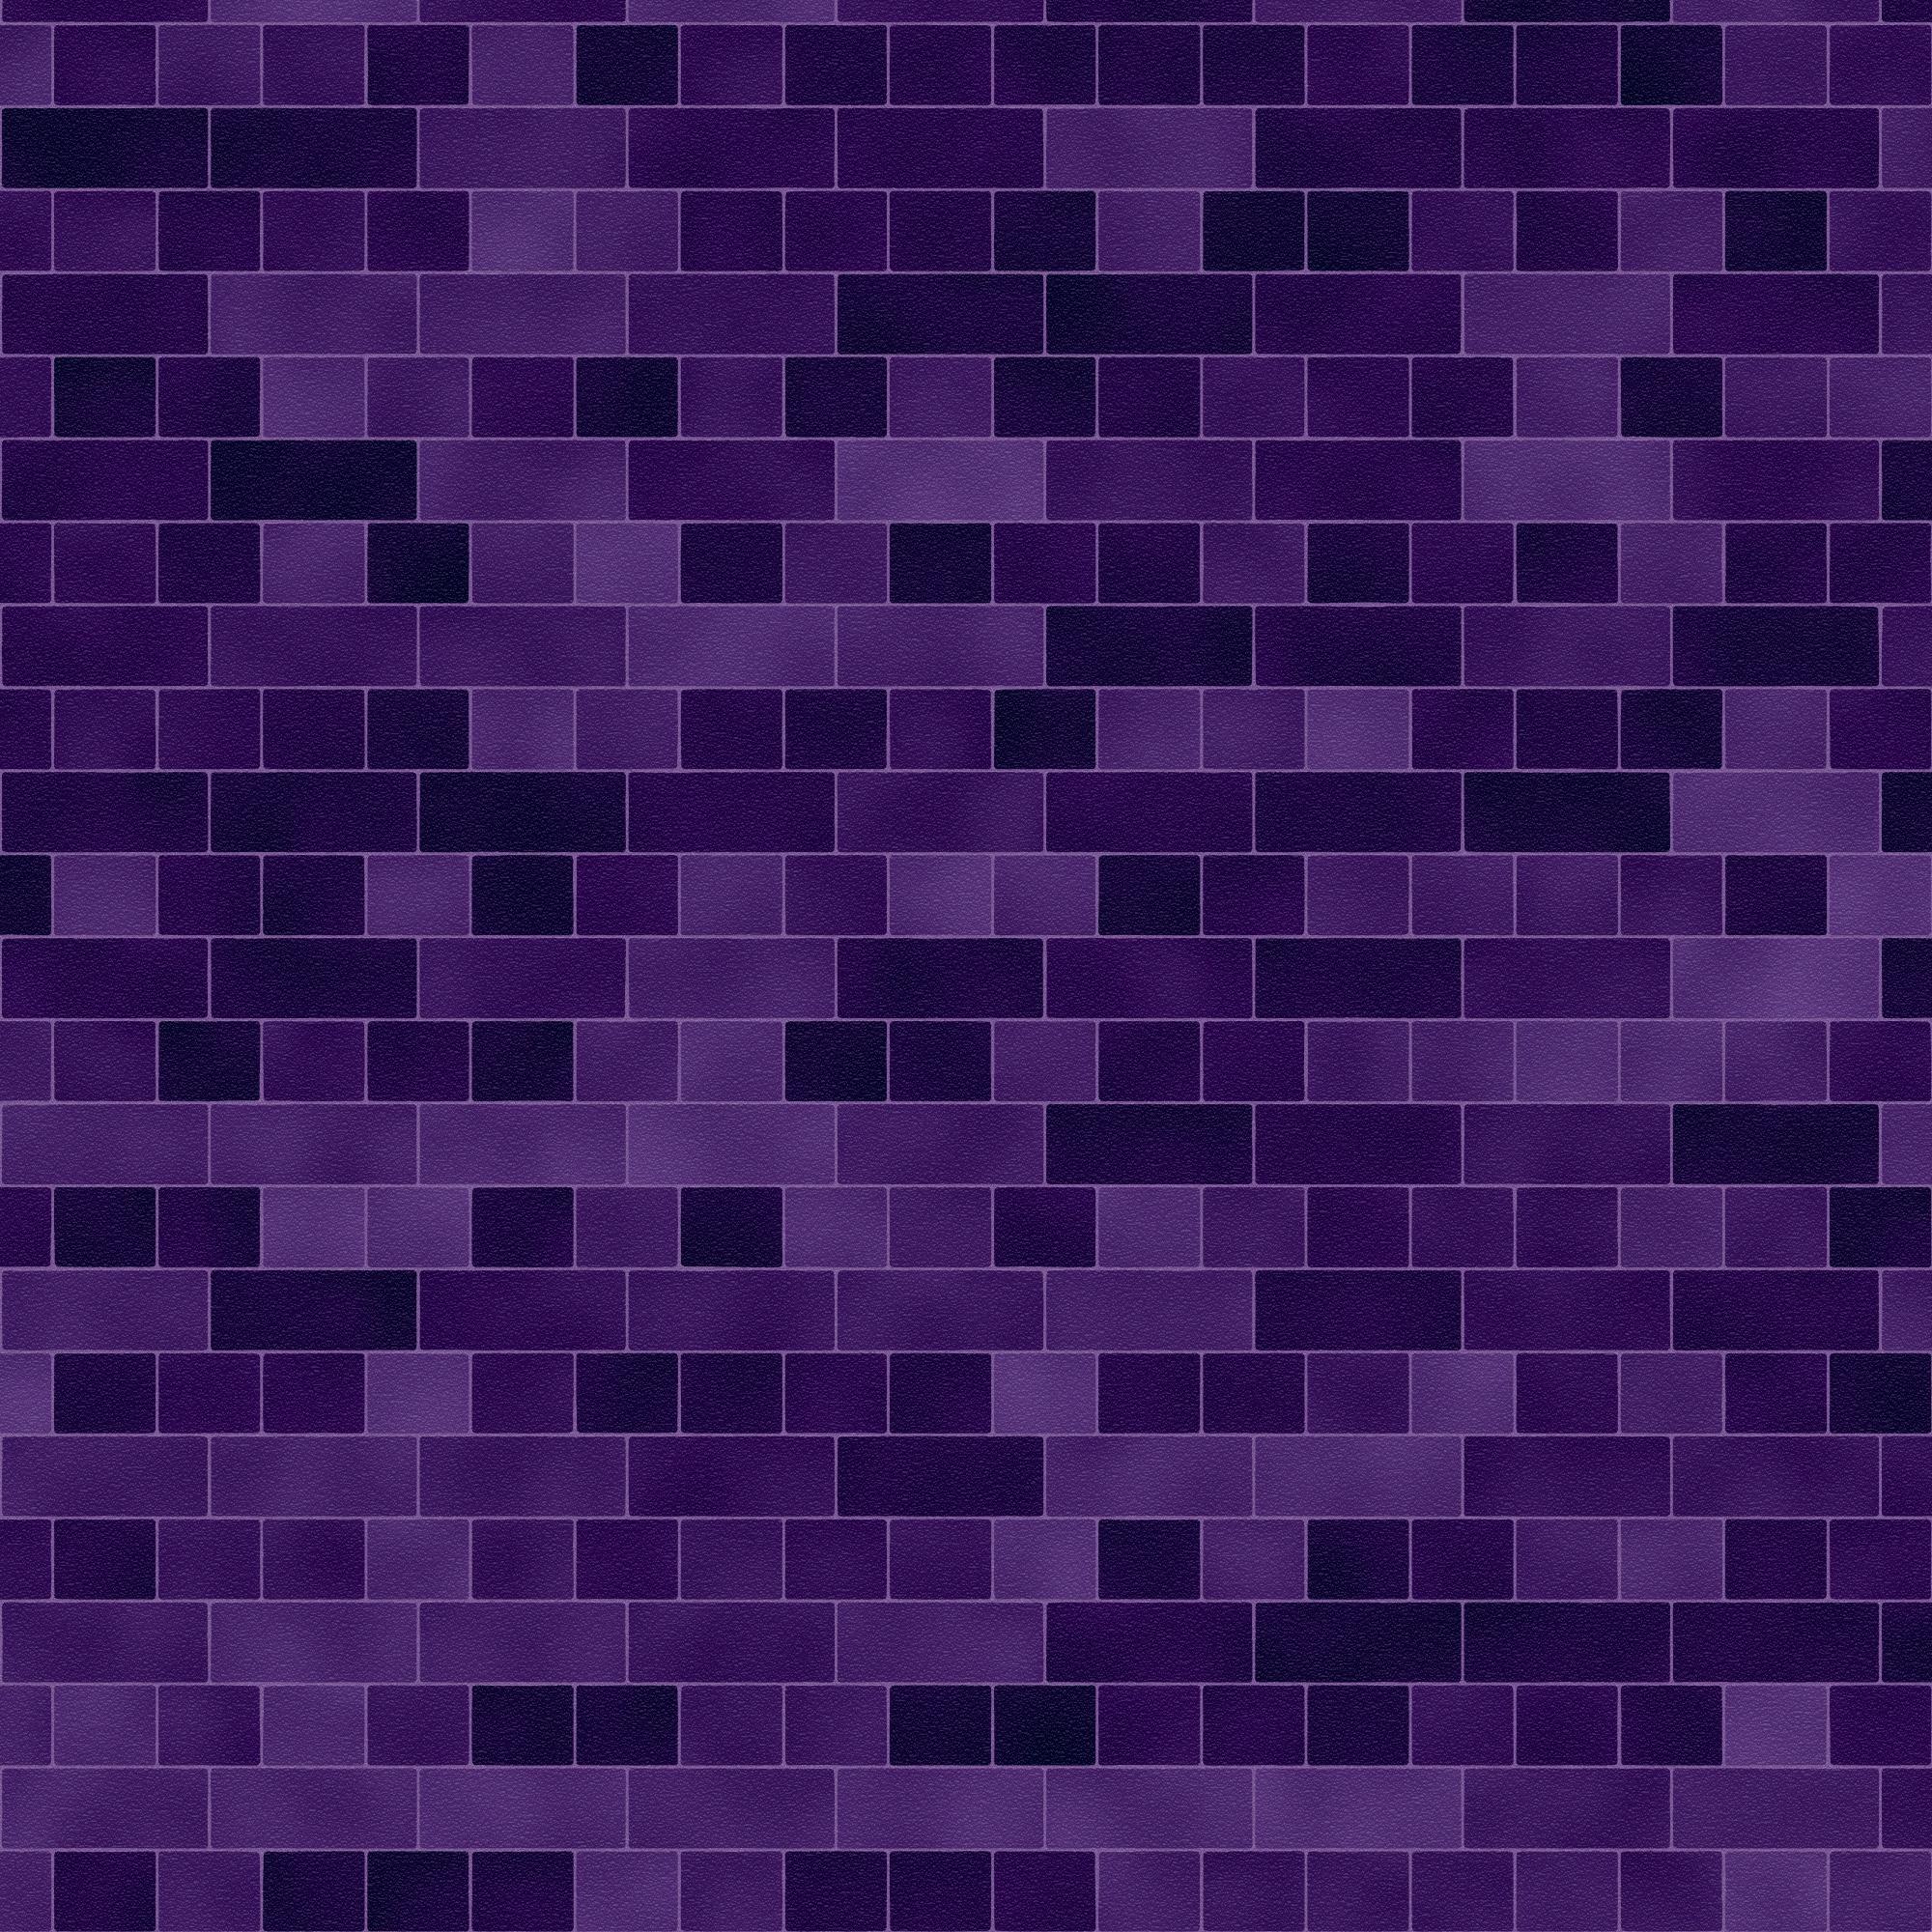 purple brick wall texture, brick wall, download photo, background, texture